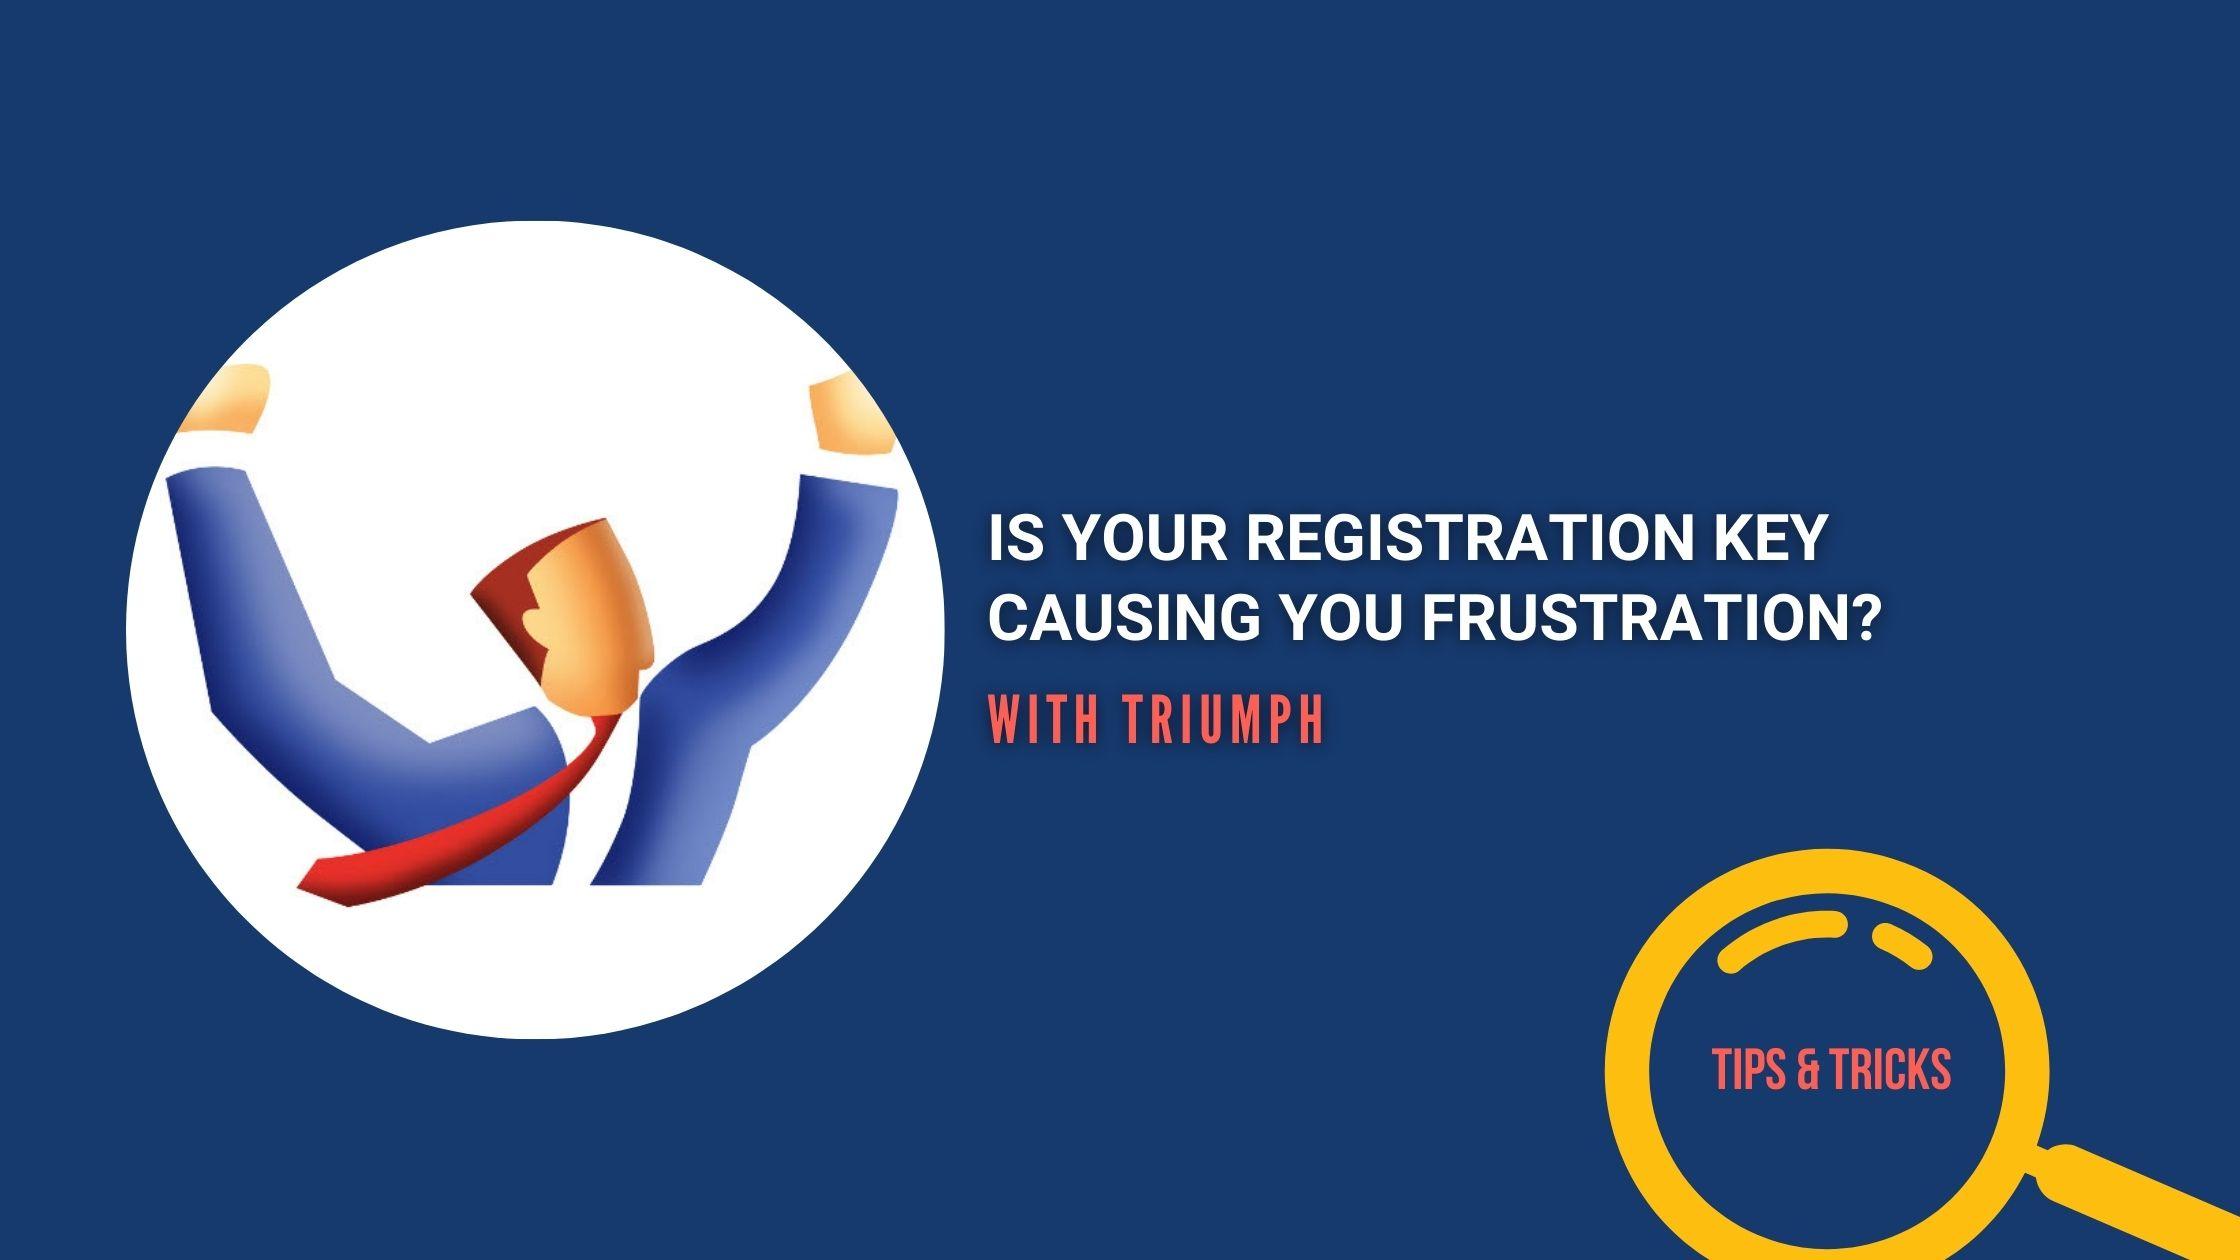 Registration key